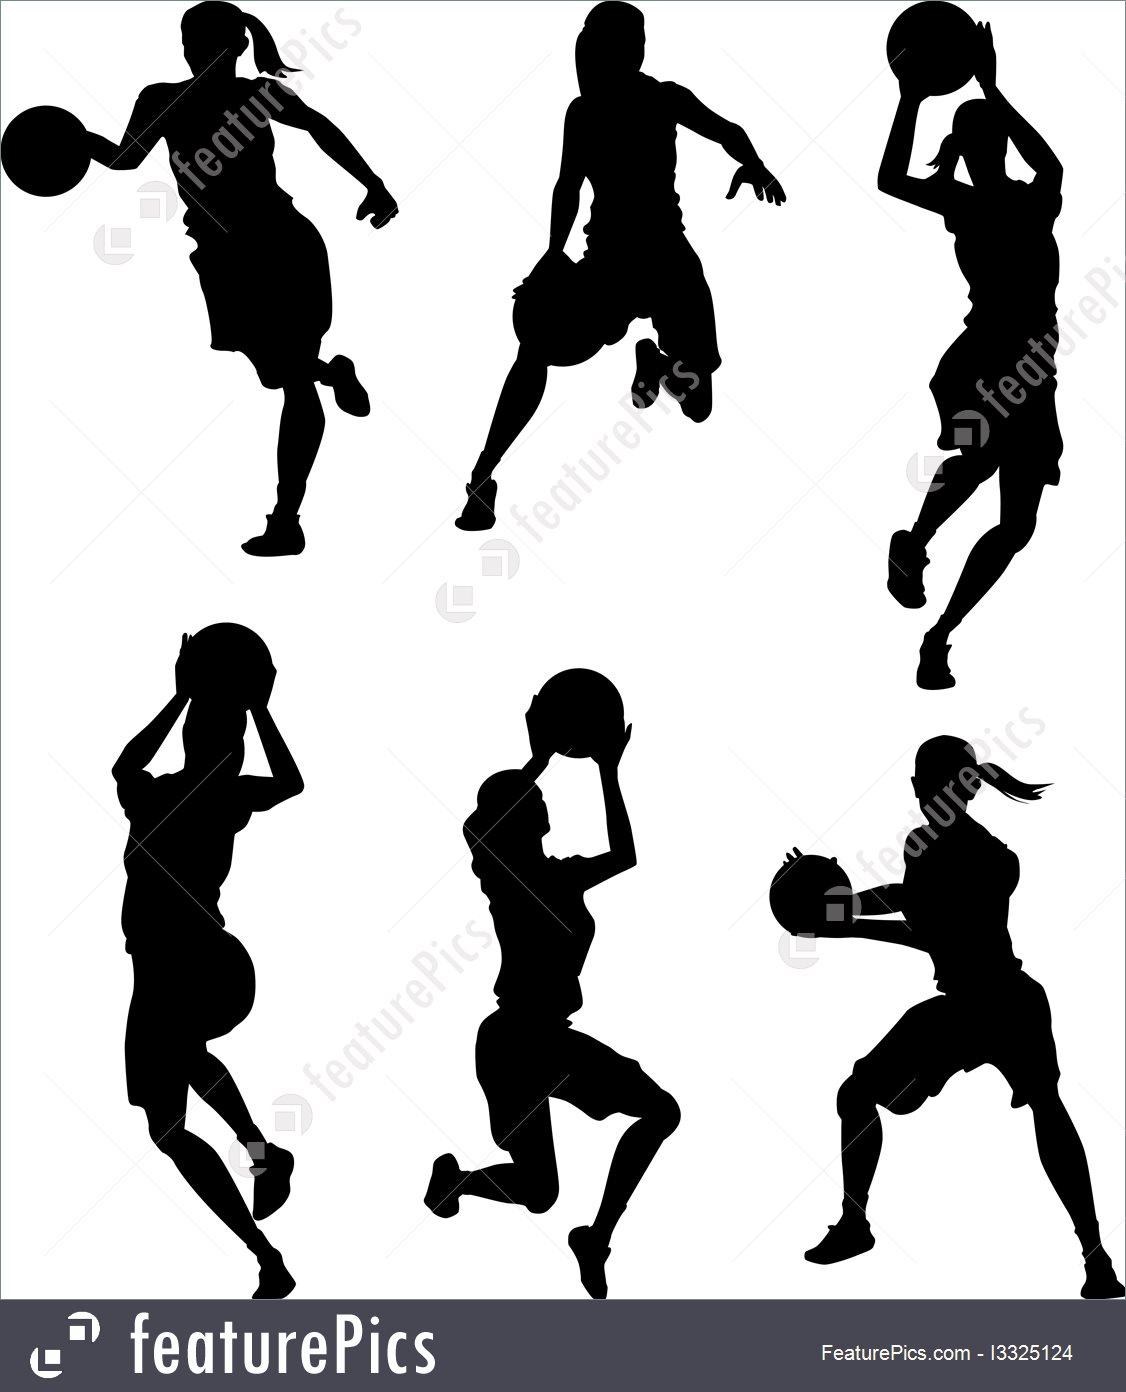 1126x1392 Basketball Female Women Silhouettes Illustration